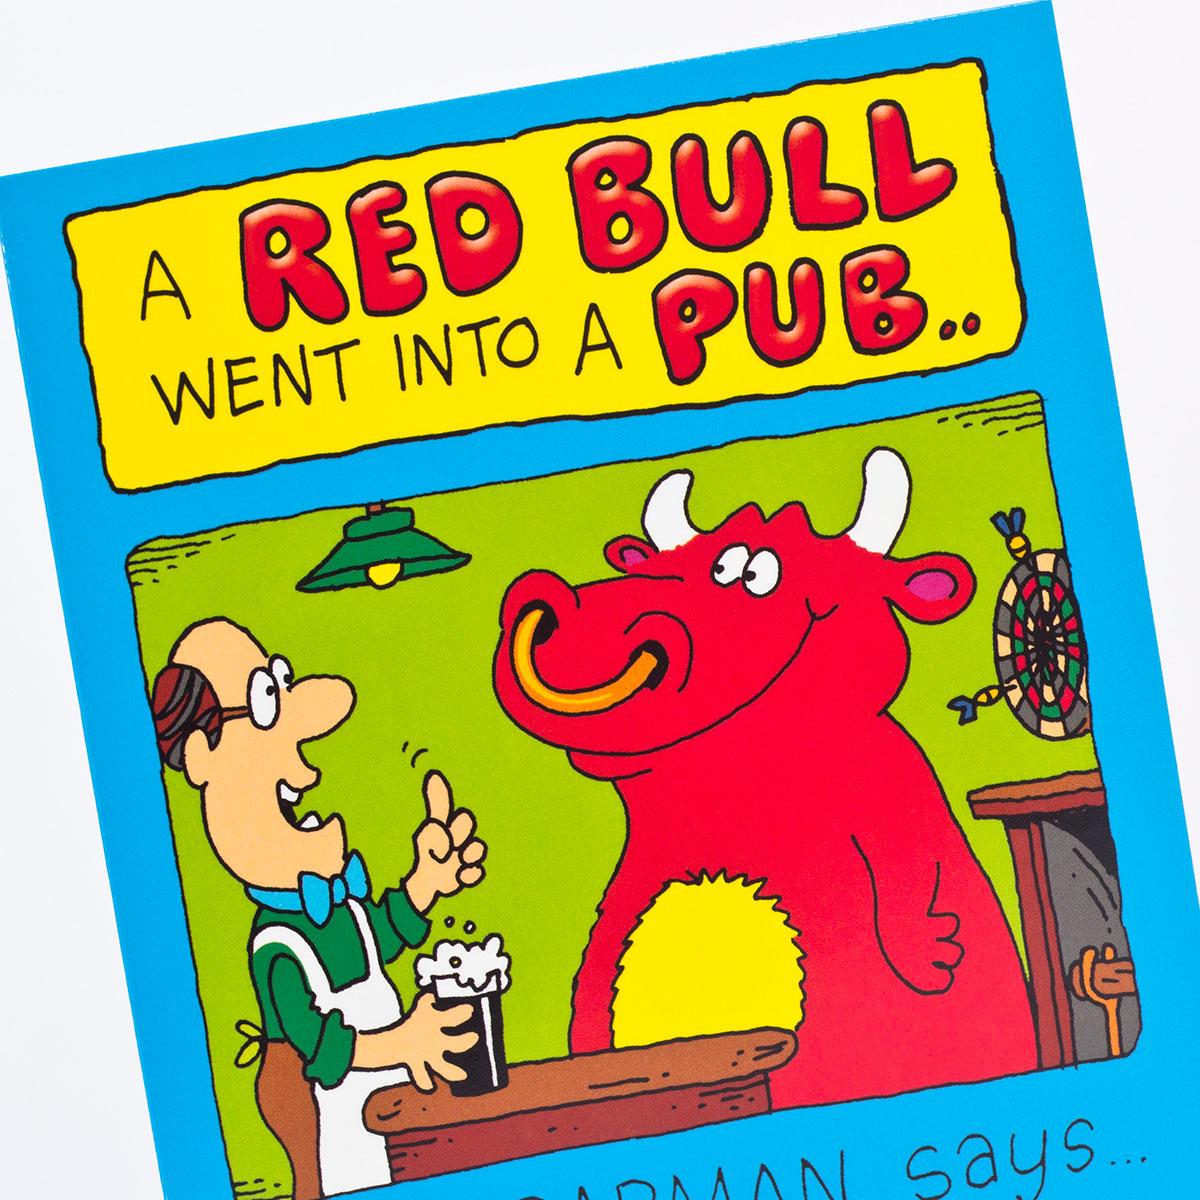 Red Bull clipart bul £1 Card Birthday  Bull